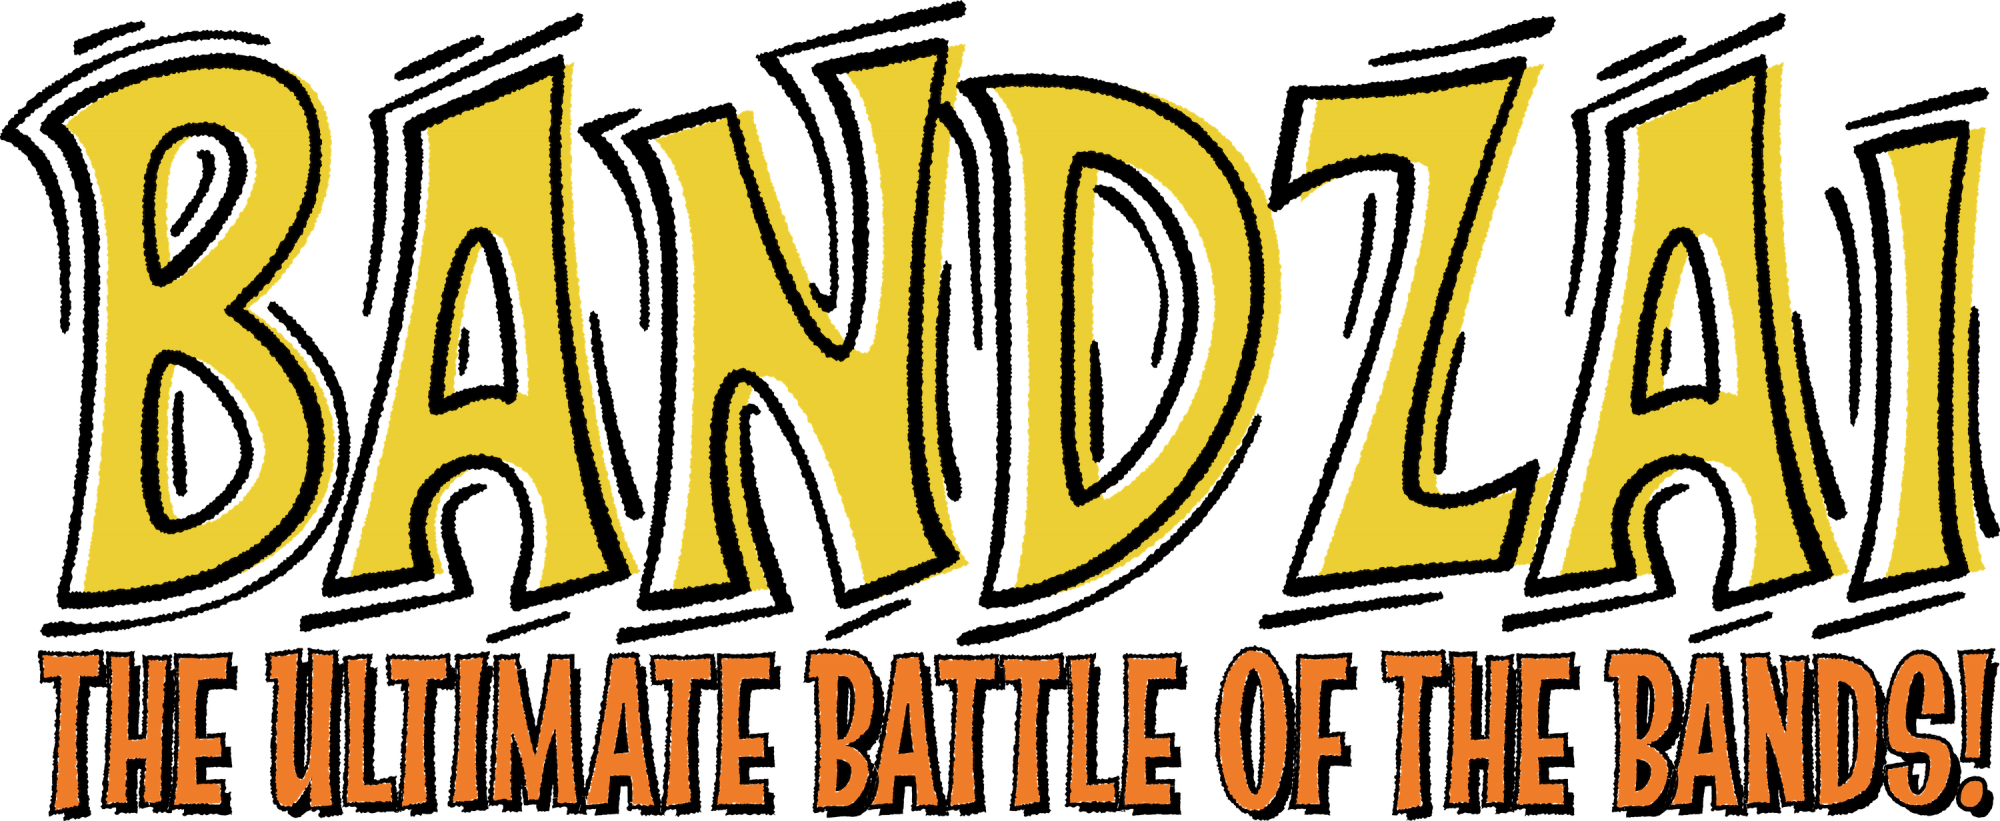 BANDZAI TOP 100 ANNOUNCED!